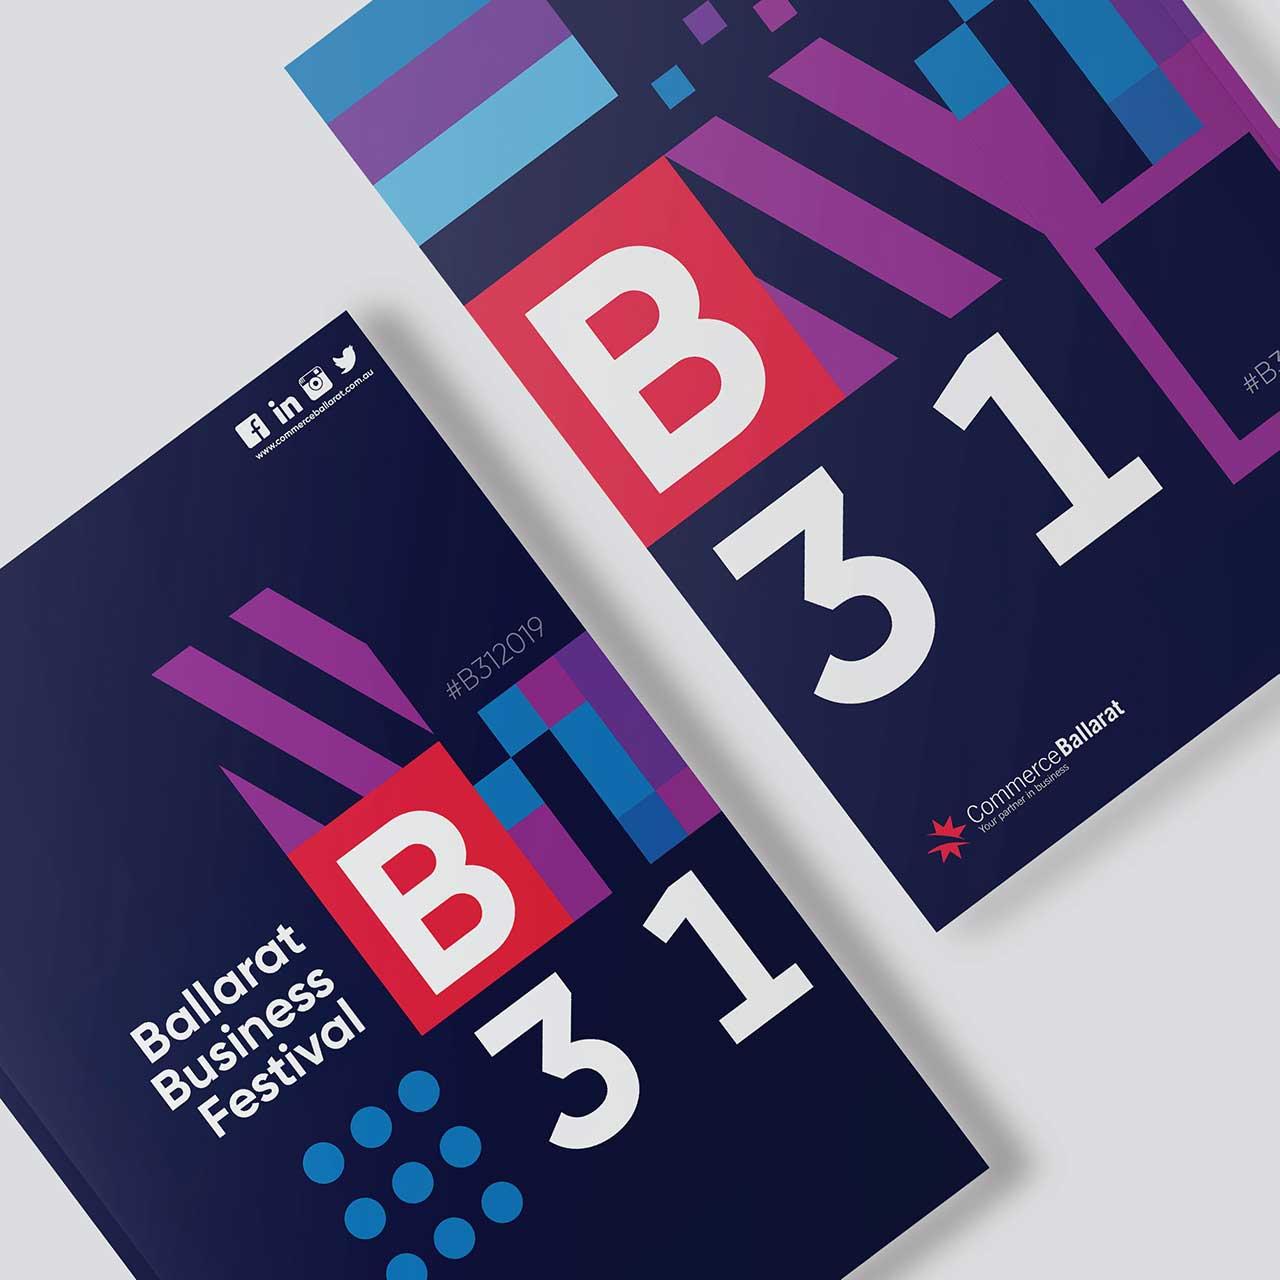 Ballarat Business Festival Branding